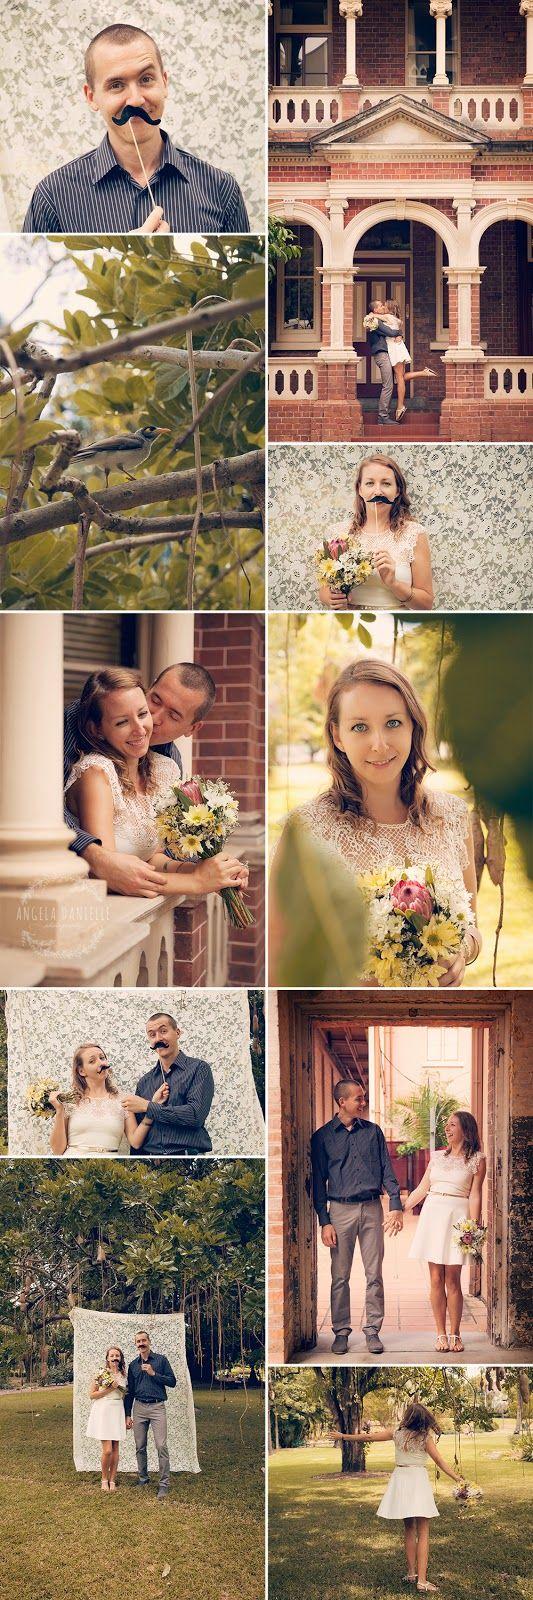 Elopement & Portrait photographer Brisbane www.angeladanielle.com.au